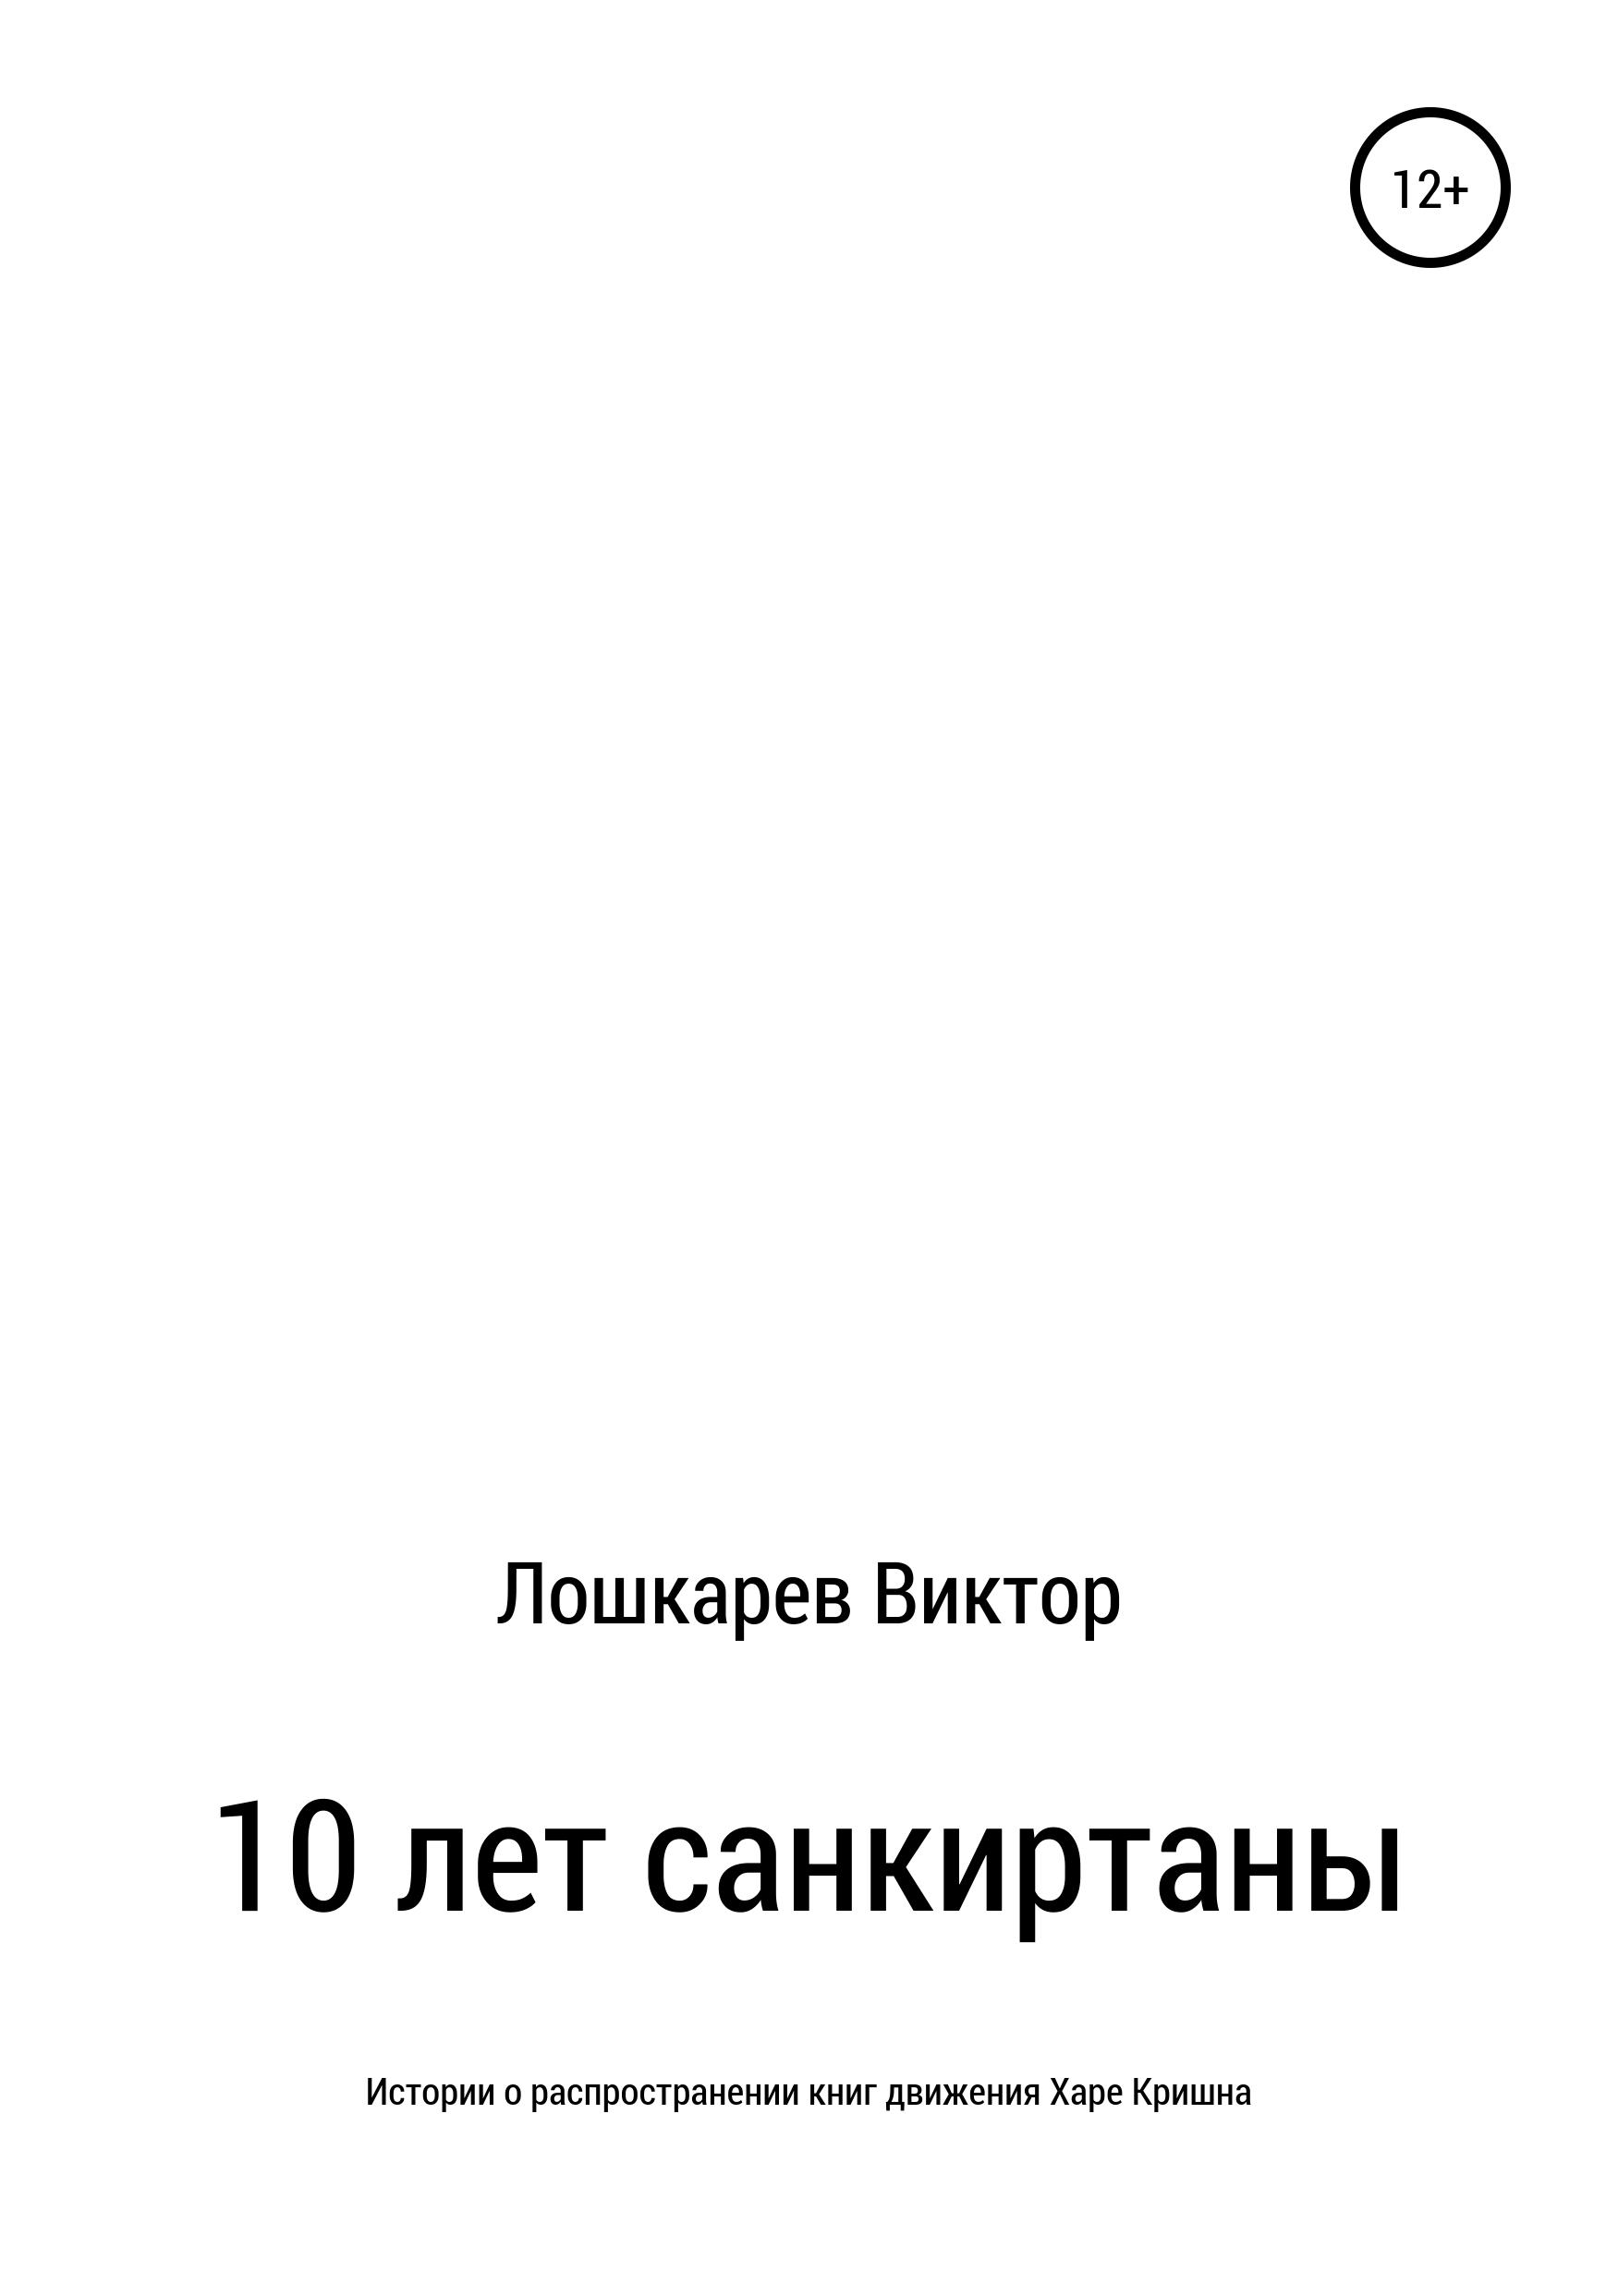 10 лет санкиртаны